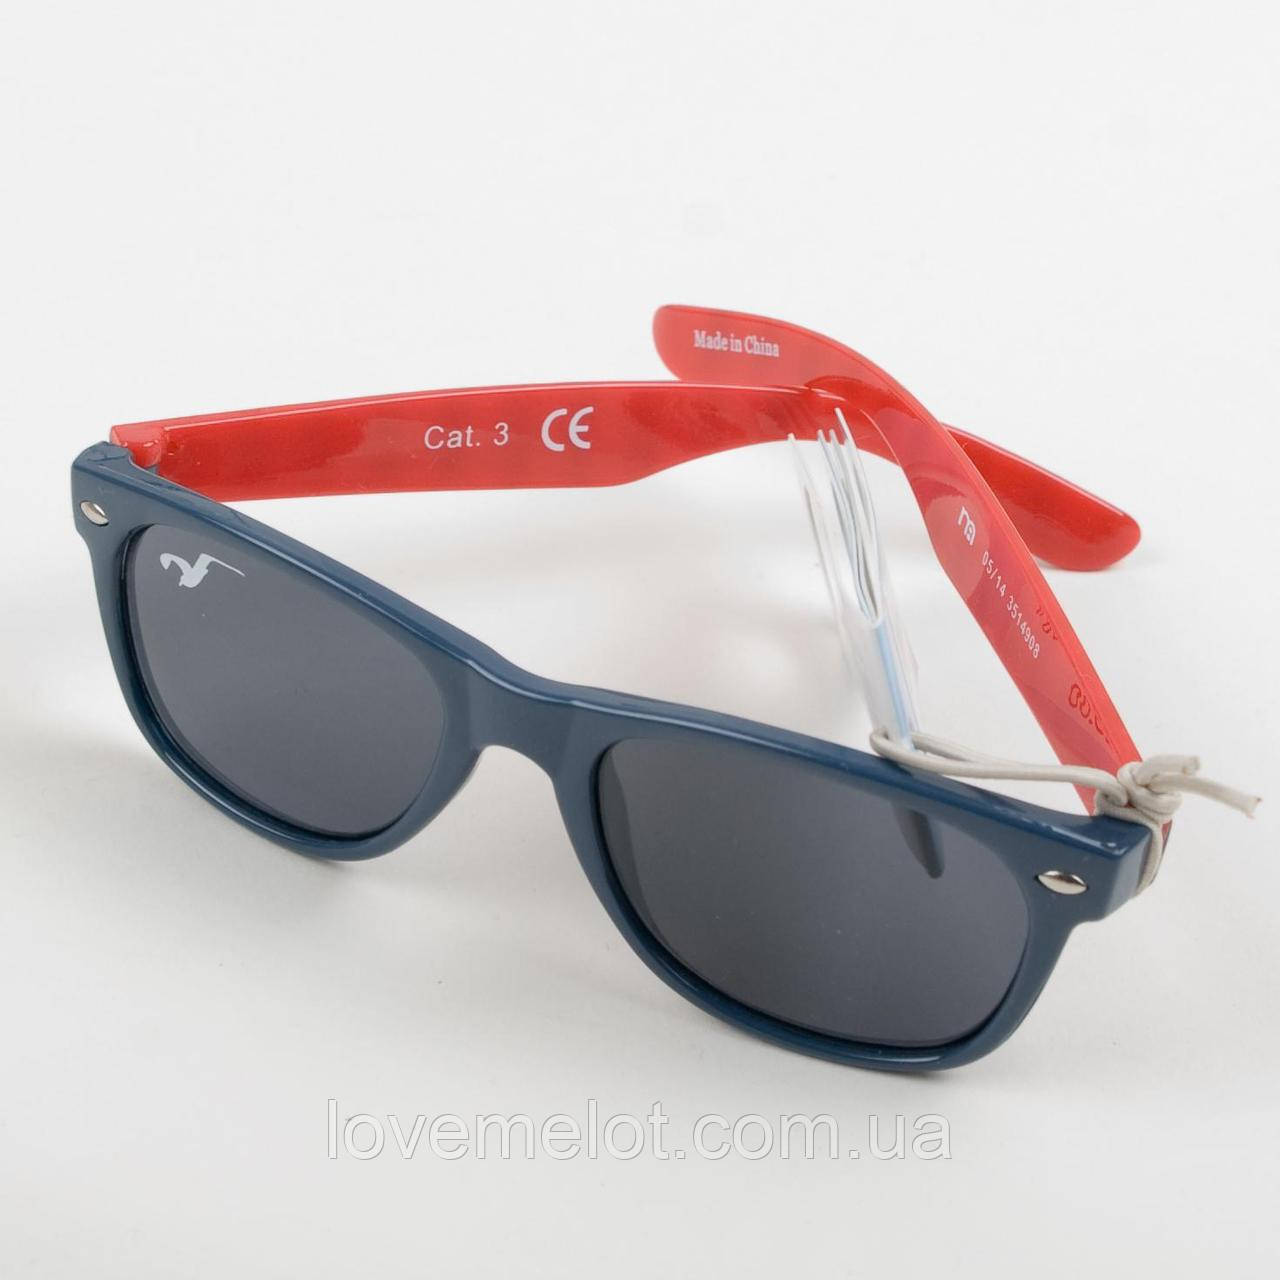 aa8f20631c68 Детские солнцезащитные очки